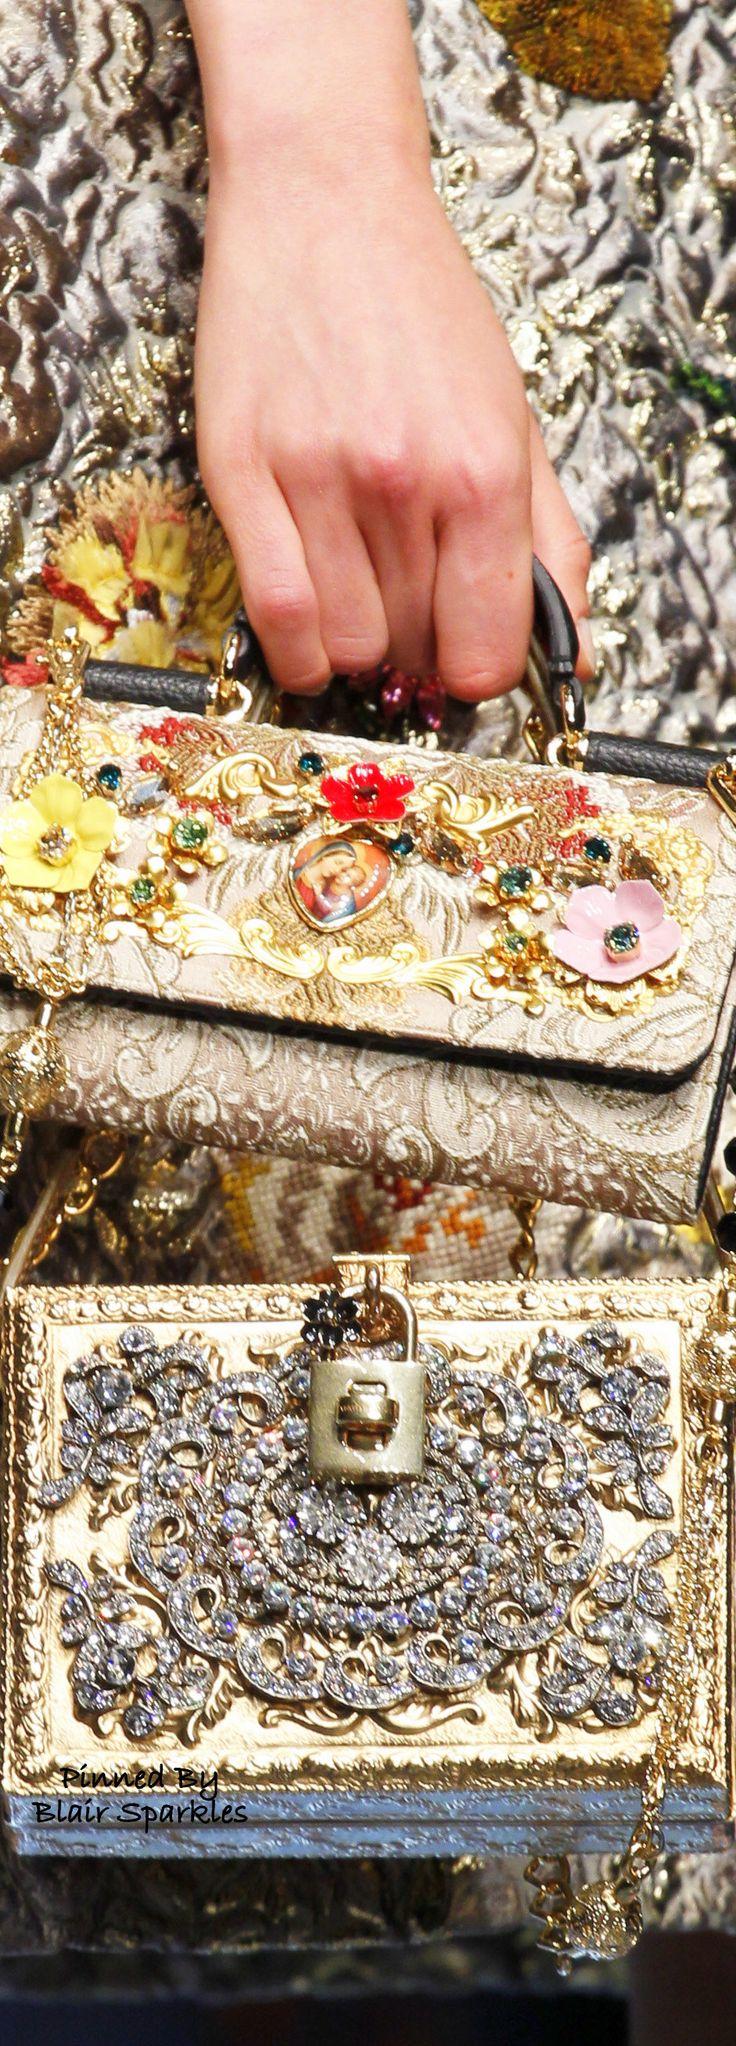 SPRING RTW 2016 (MFW) Dolce & Gabbana { Details } ~ ♕♚εїз | BLAIR SPARKLES |